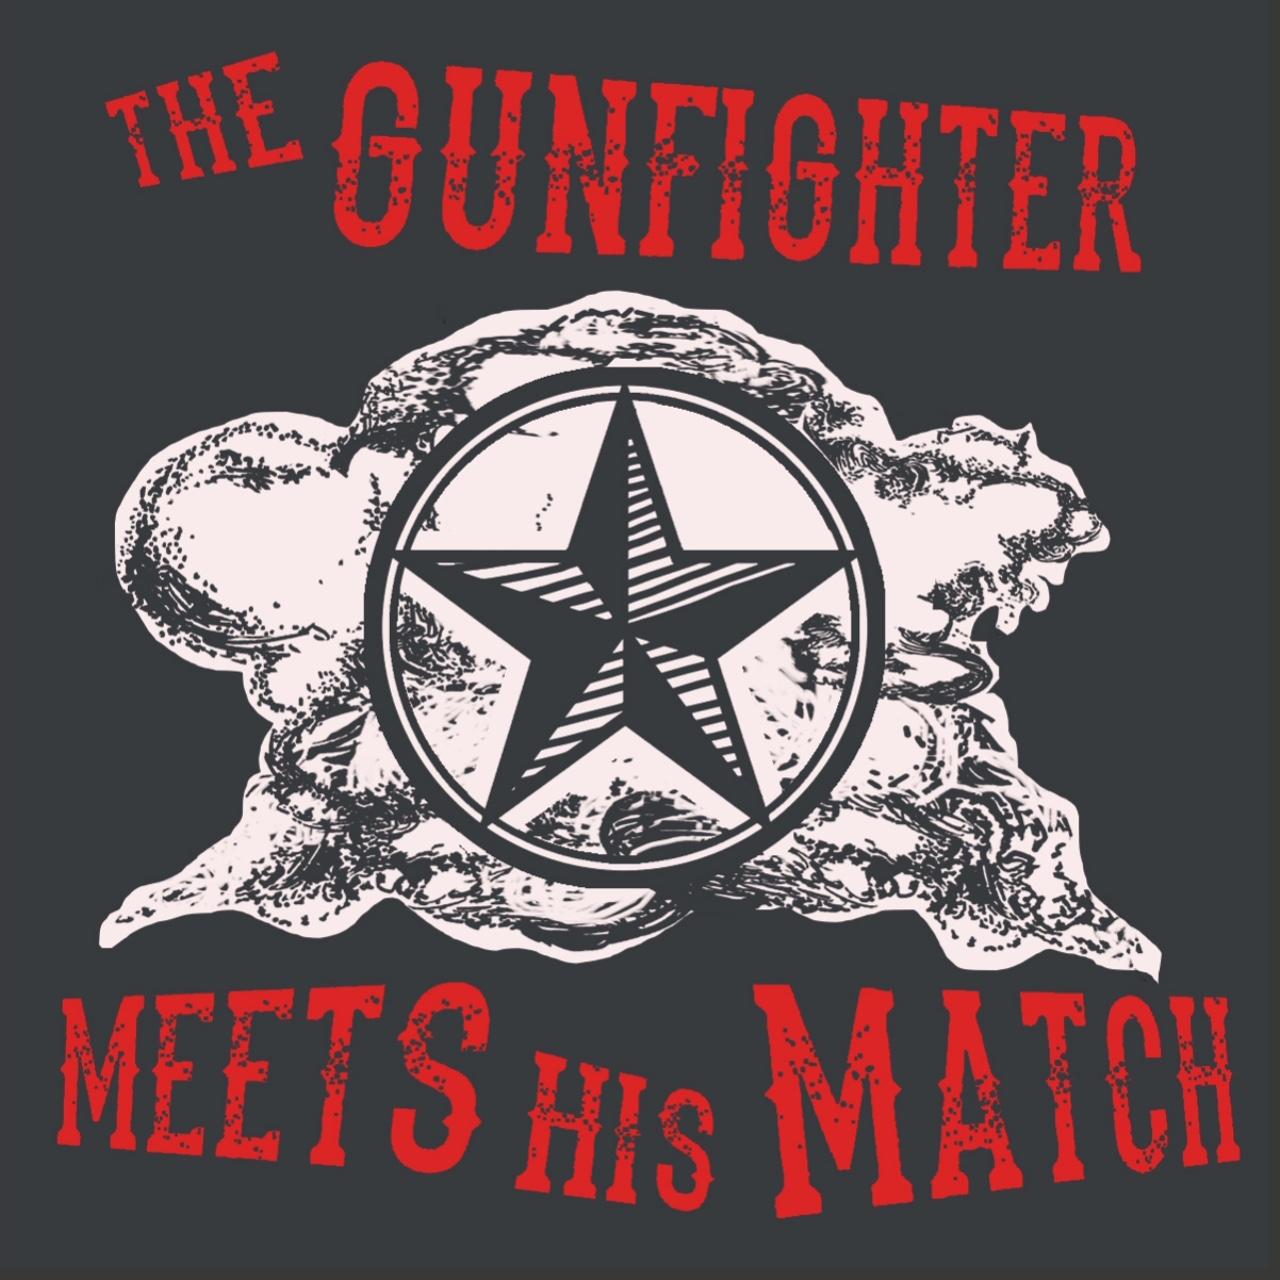 gunfighter-1200x1200px-square-1.jpg